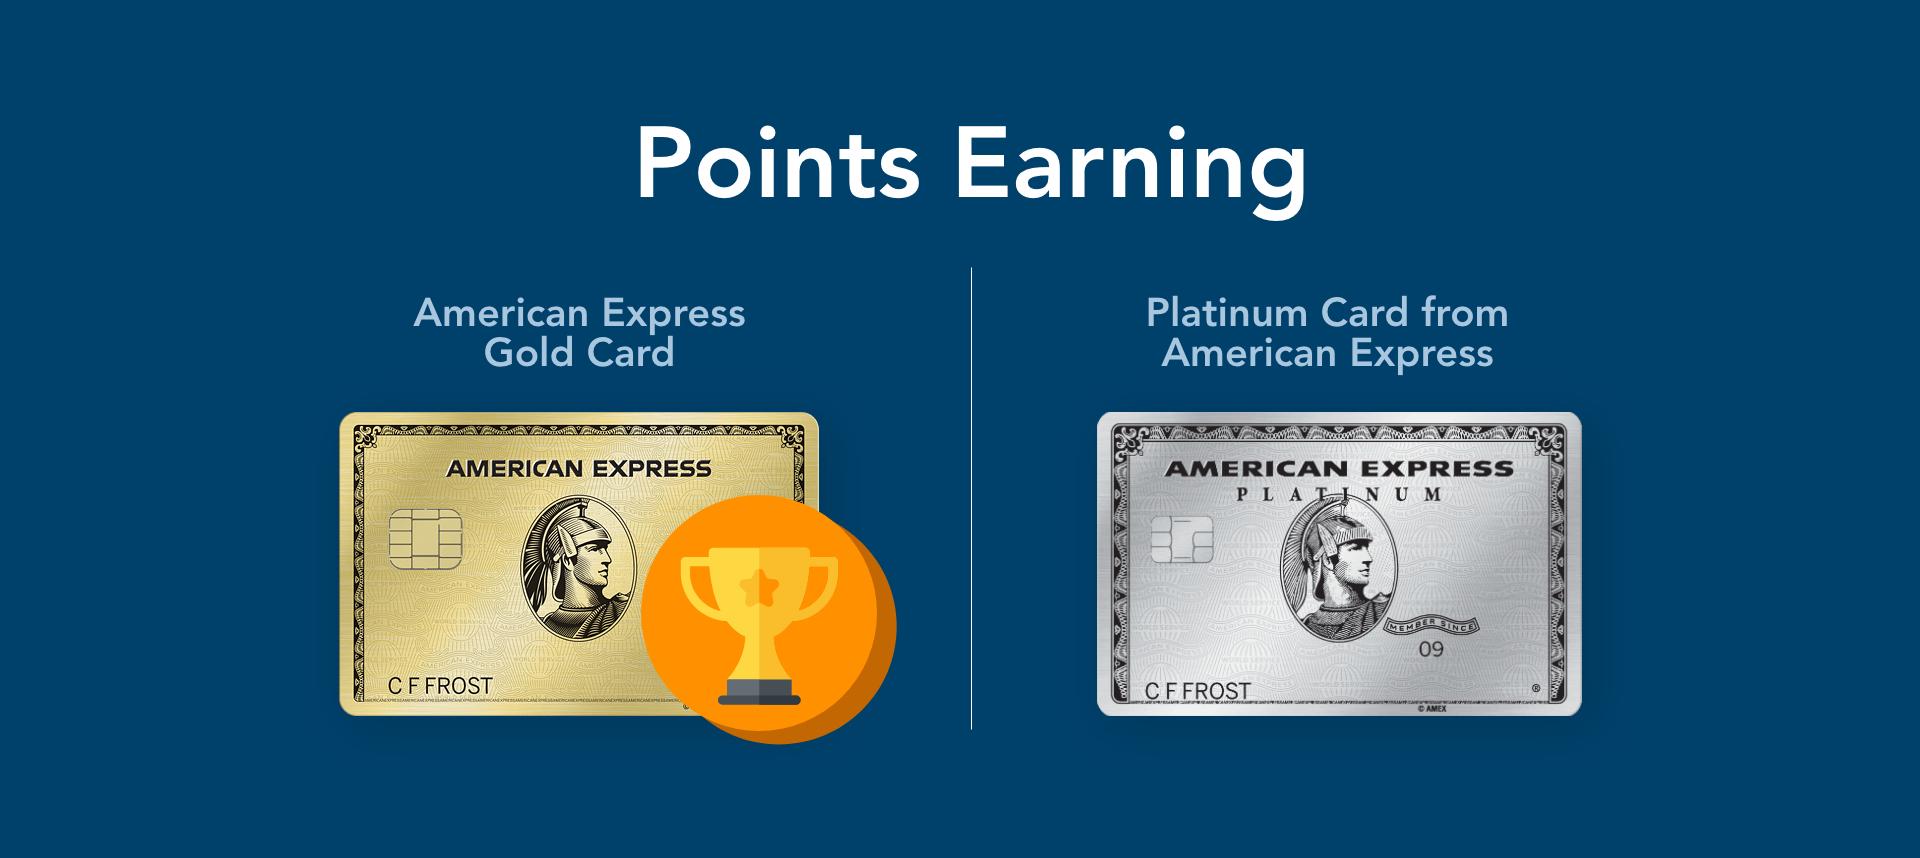 amex gold vs platinum points